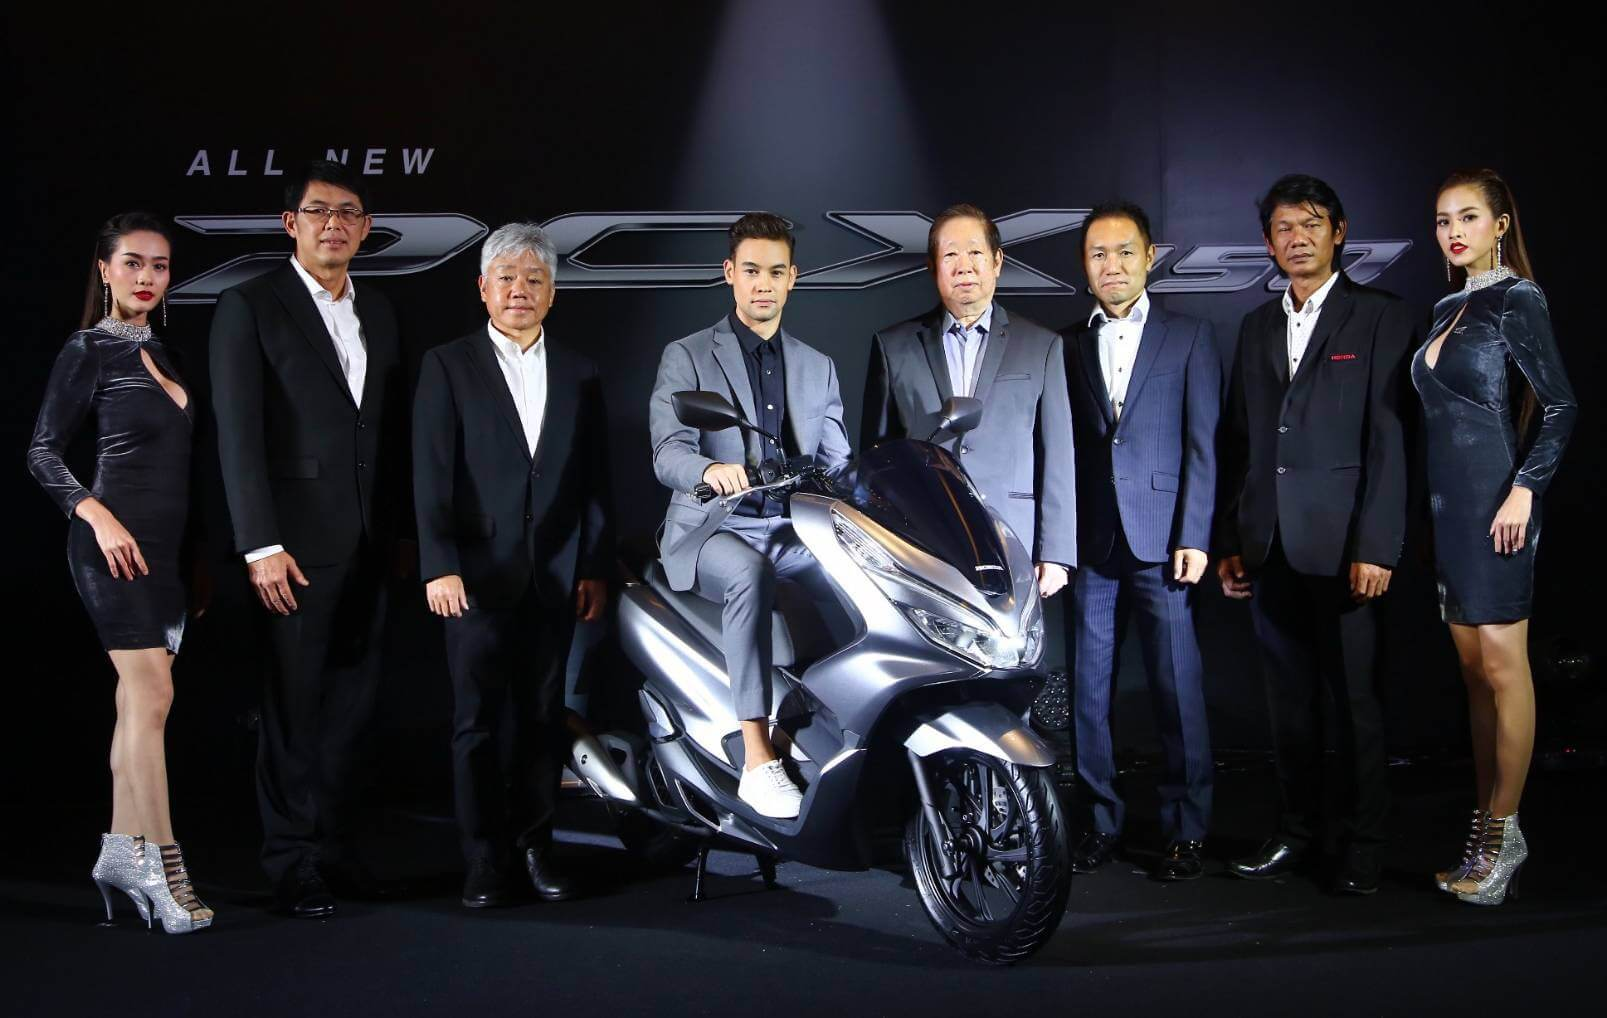 Honda-Motorcycle-มอเตอร์ไซค์-ฮอนด้า-pcx150-2018-ข่าวประชาสัมพันธ์-ข่าวผลิตภัณฑ์-ที่สุดแห่งการครอบครอง